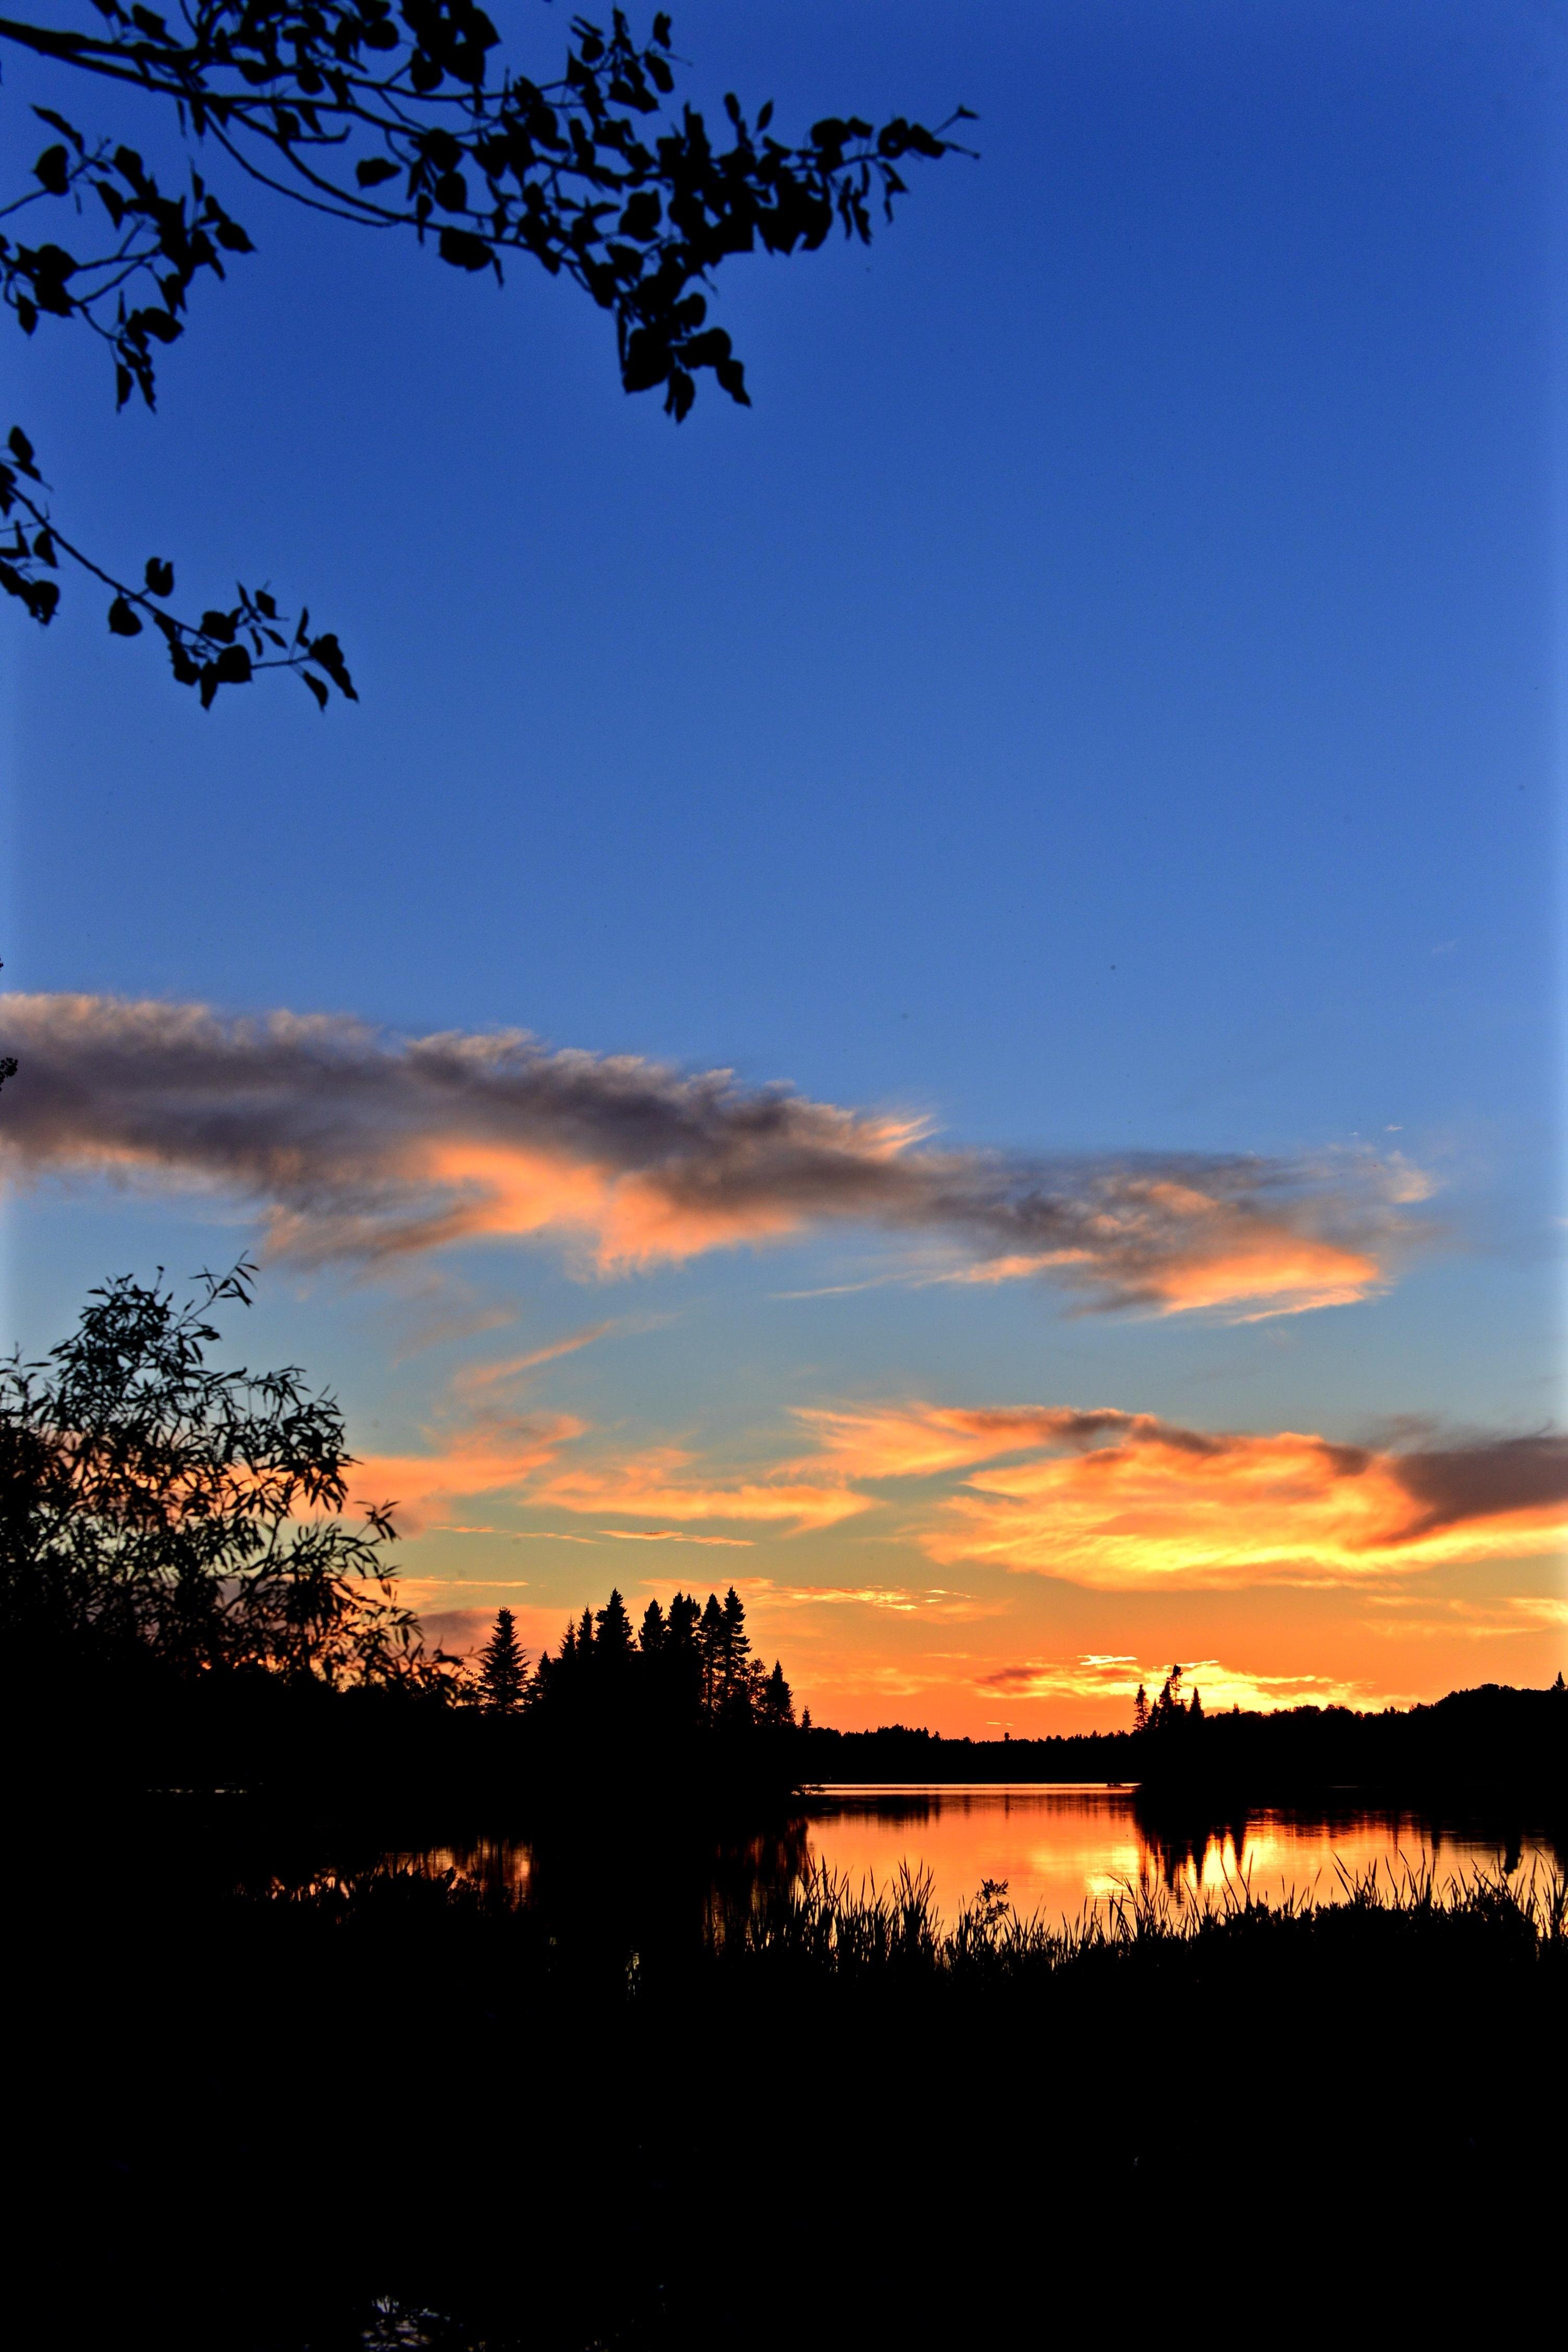 150910 download wallpaper Landscape, Sunset, Twilight, Lake, Dark, Dusk screensavers and pictures for free